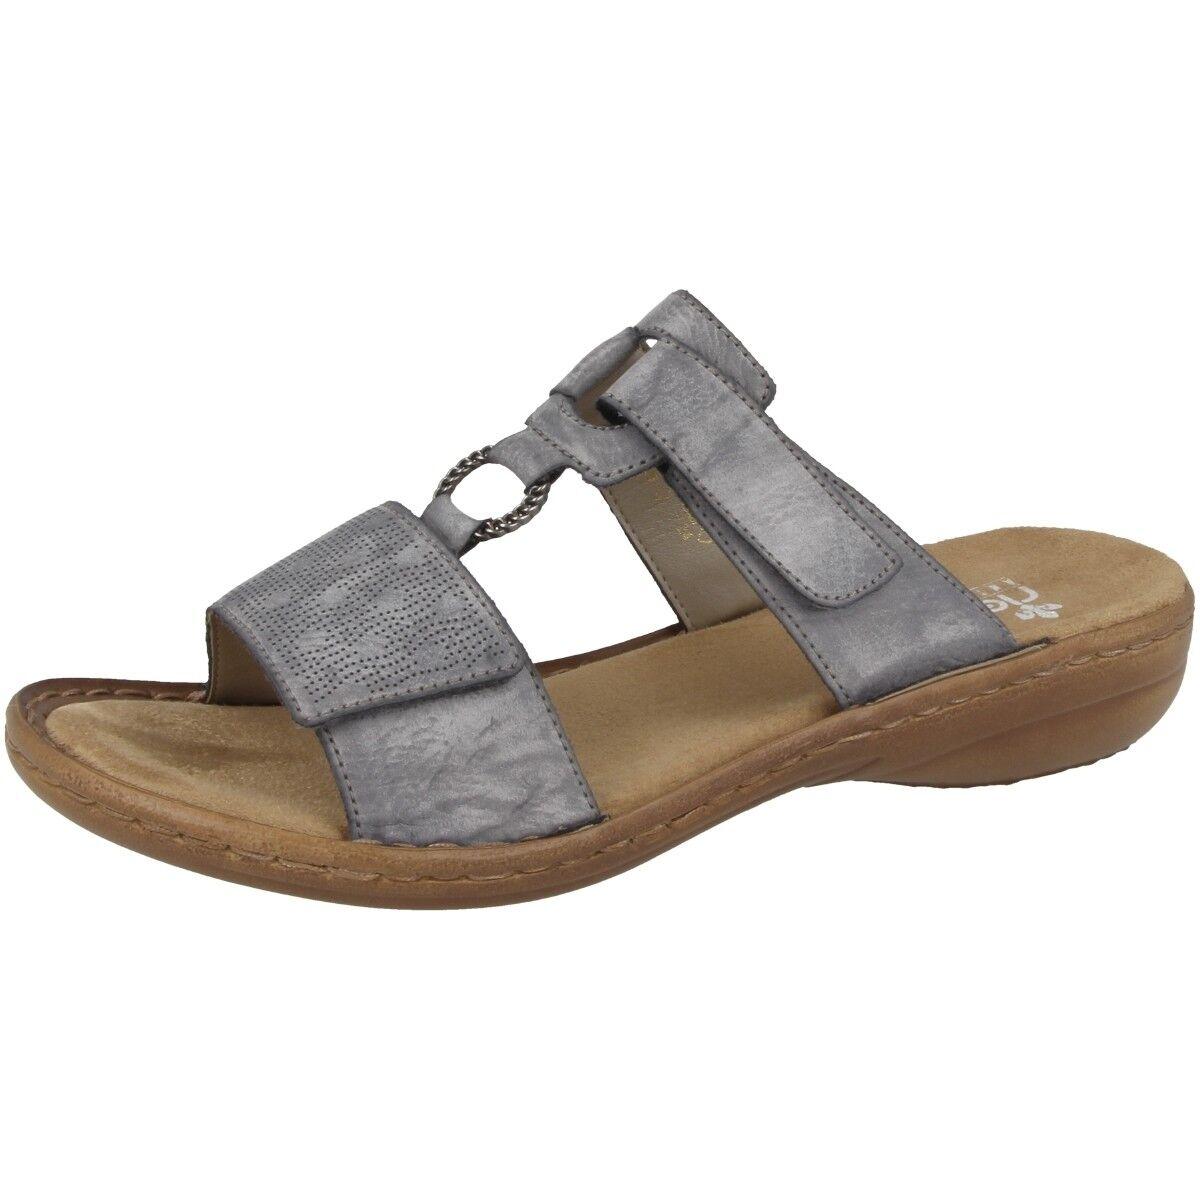 Rieker Eagle chaussures femmes Mules Sandals Leisure Slippers bleu 60885-12